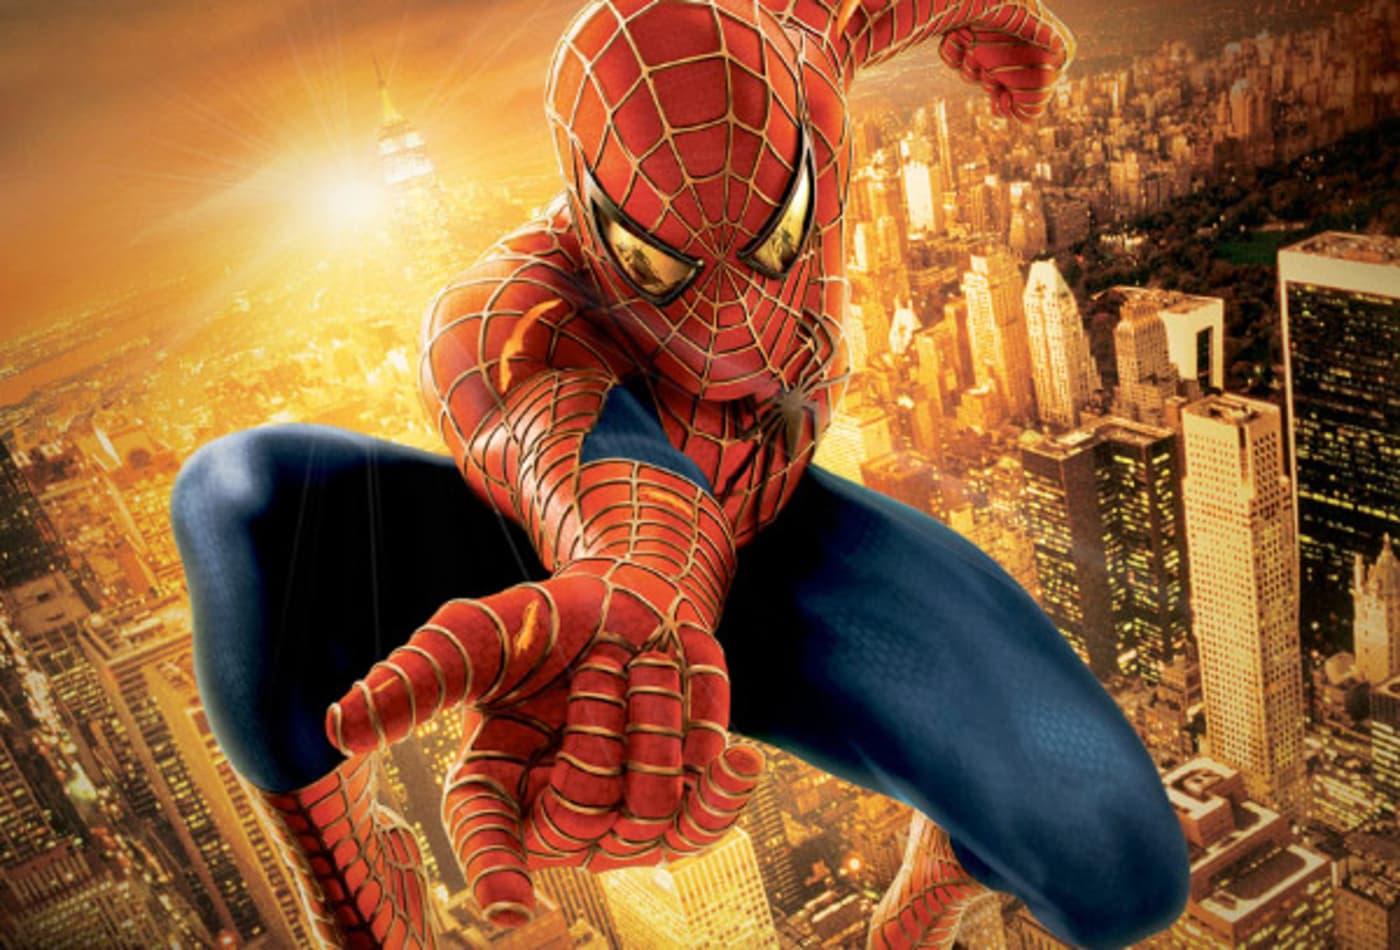 46955354 CNBC_superhero_films_2011_Spiderman.jpg